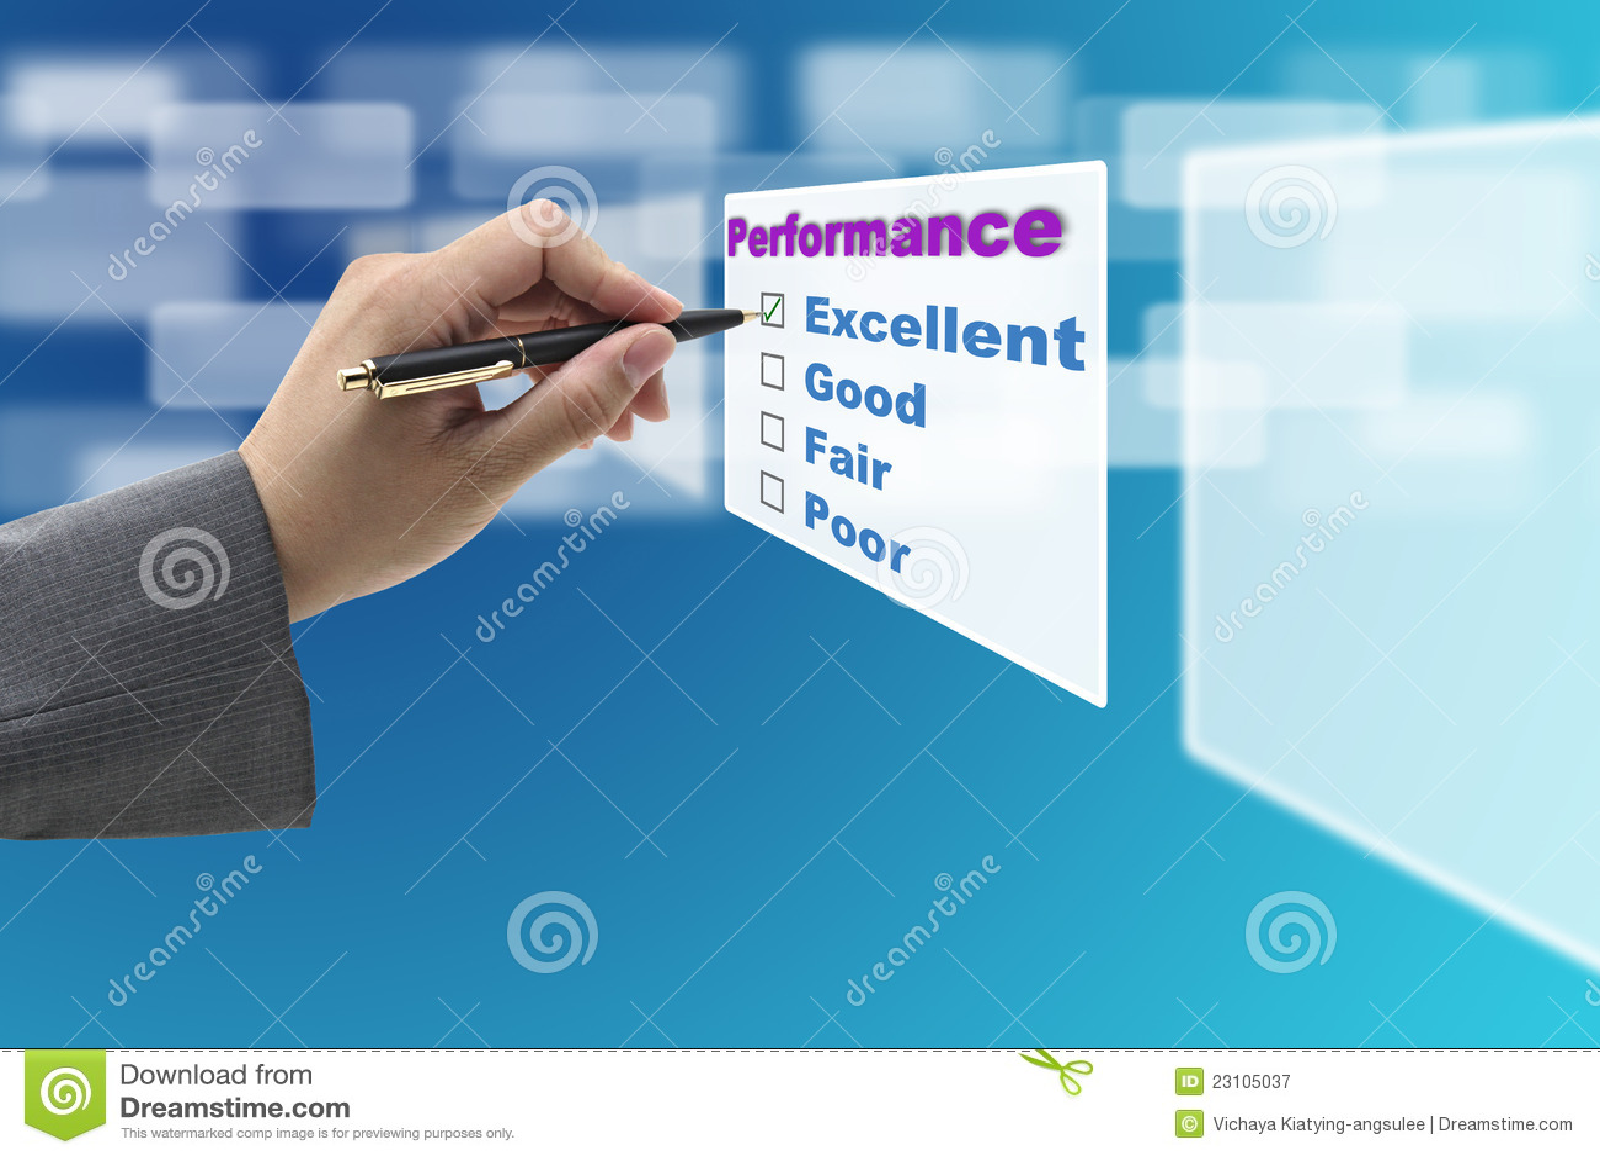 excellent-performance-audit-23105037.jpg